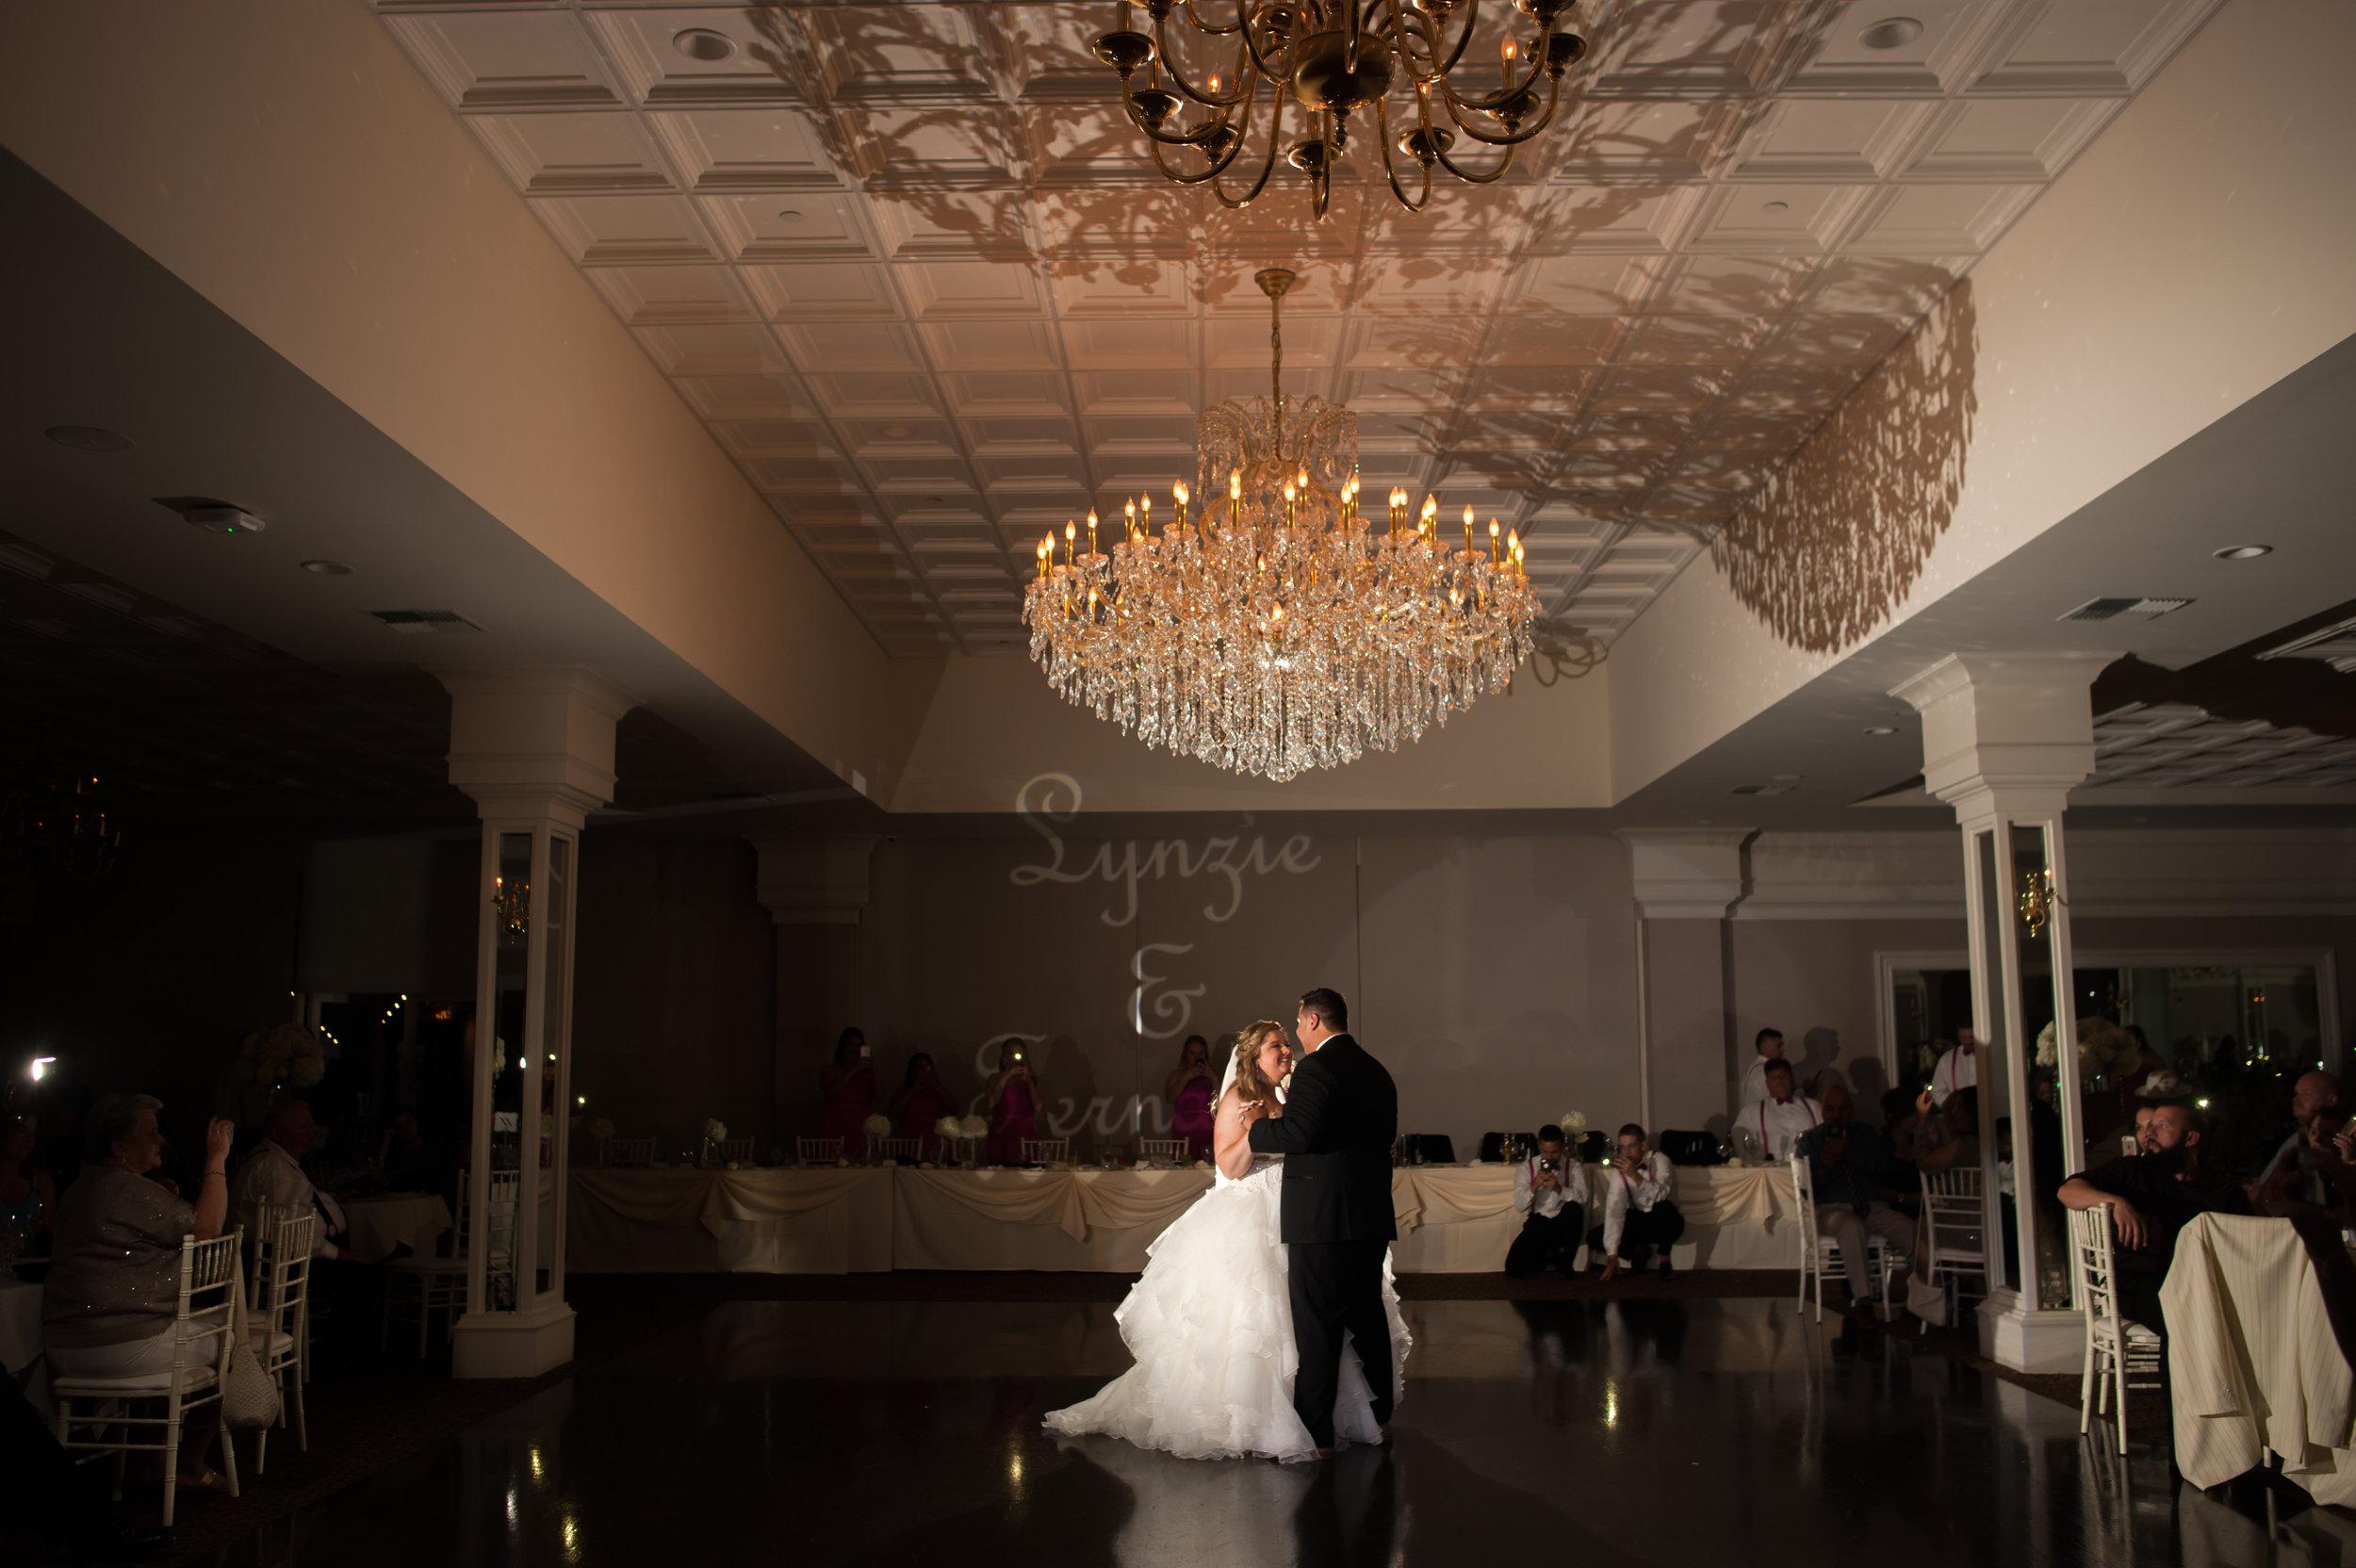 lyndzie-javier-028-arden-hills-sacramento-wedding-photographer-katherine-nicole-photography.JPG